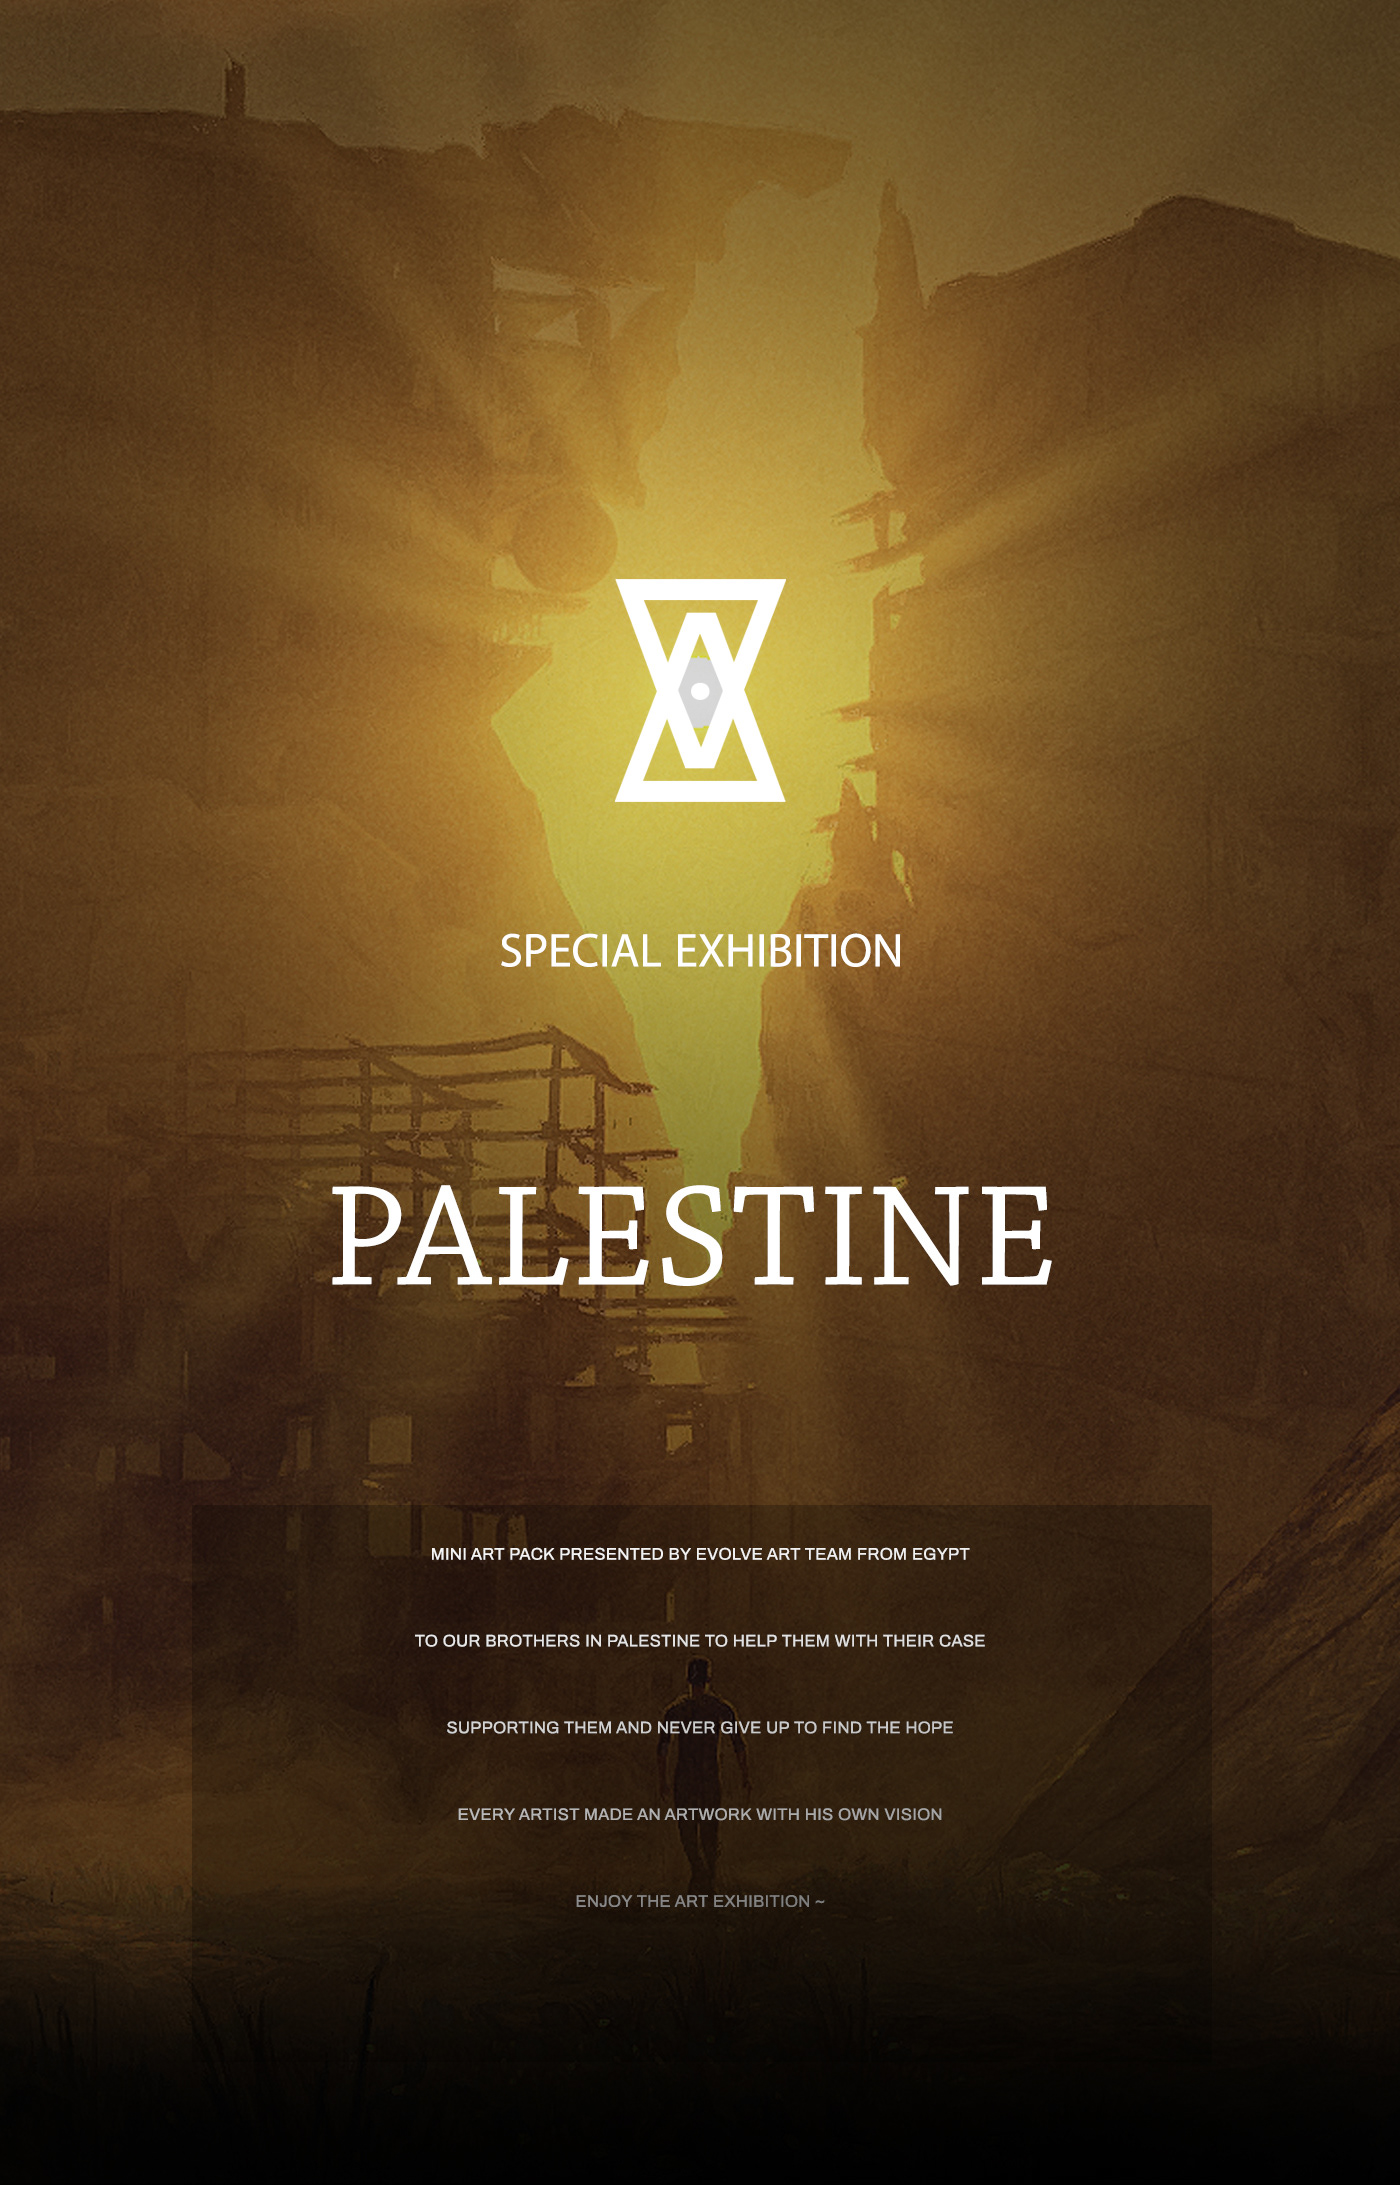 art artwork Digital Art  digital painting egypt ILLUSTRATION  mixed media palestine War 3D